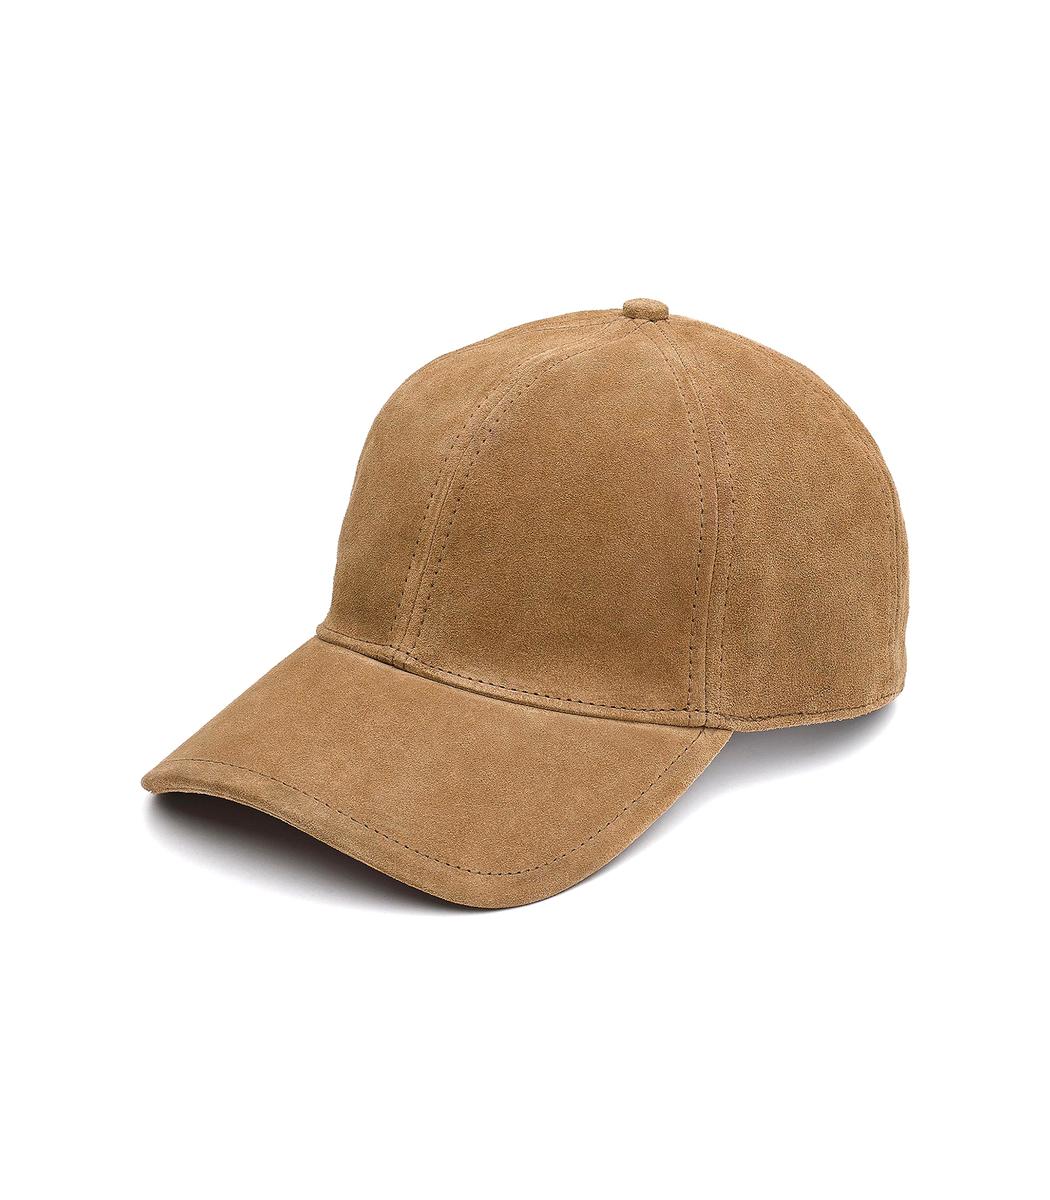 Marilyn Suede Baseball Cap - Brown, Camel